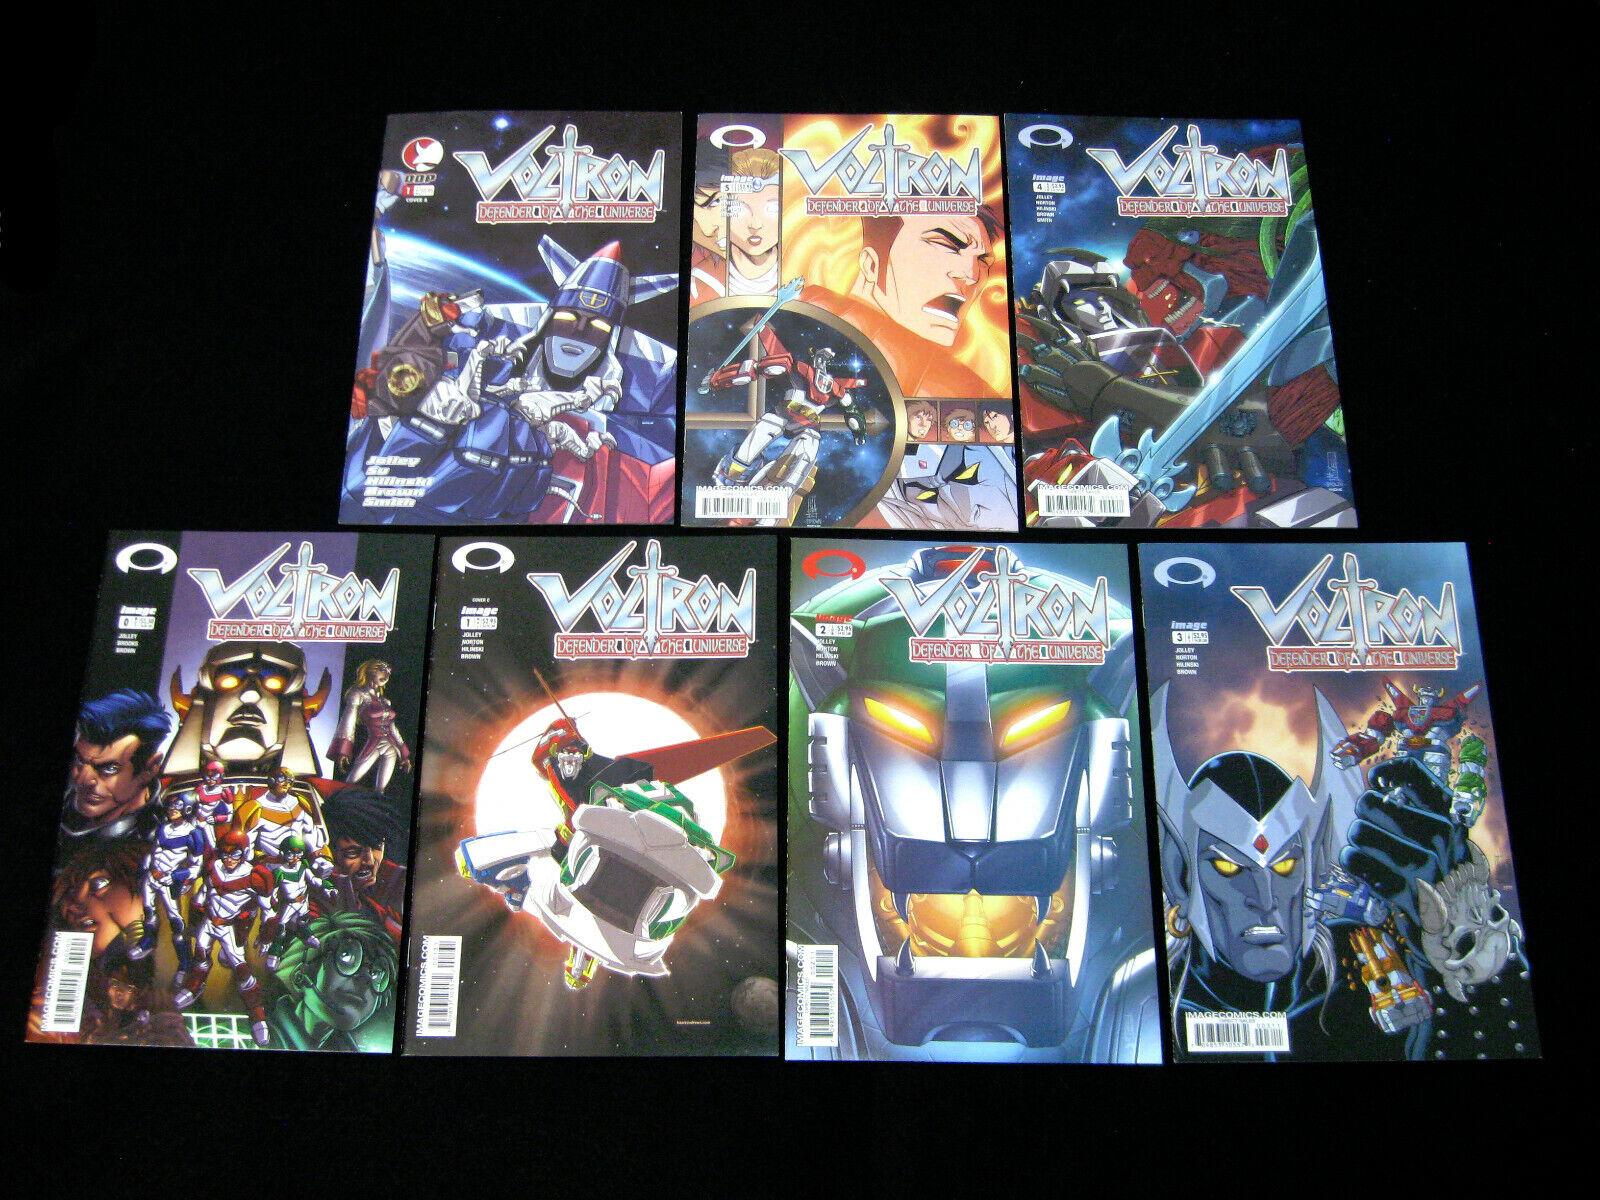 Image 01 - VOLTRON Lot of 7 Image Comic Books (2003 Vol 1 #1-5) (2004 Vol 2 #1) Superhero